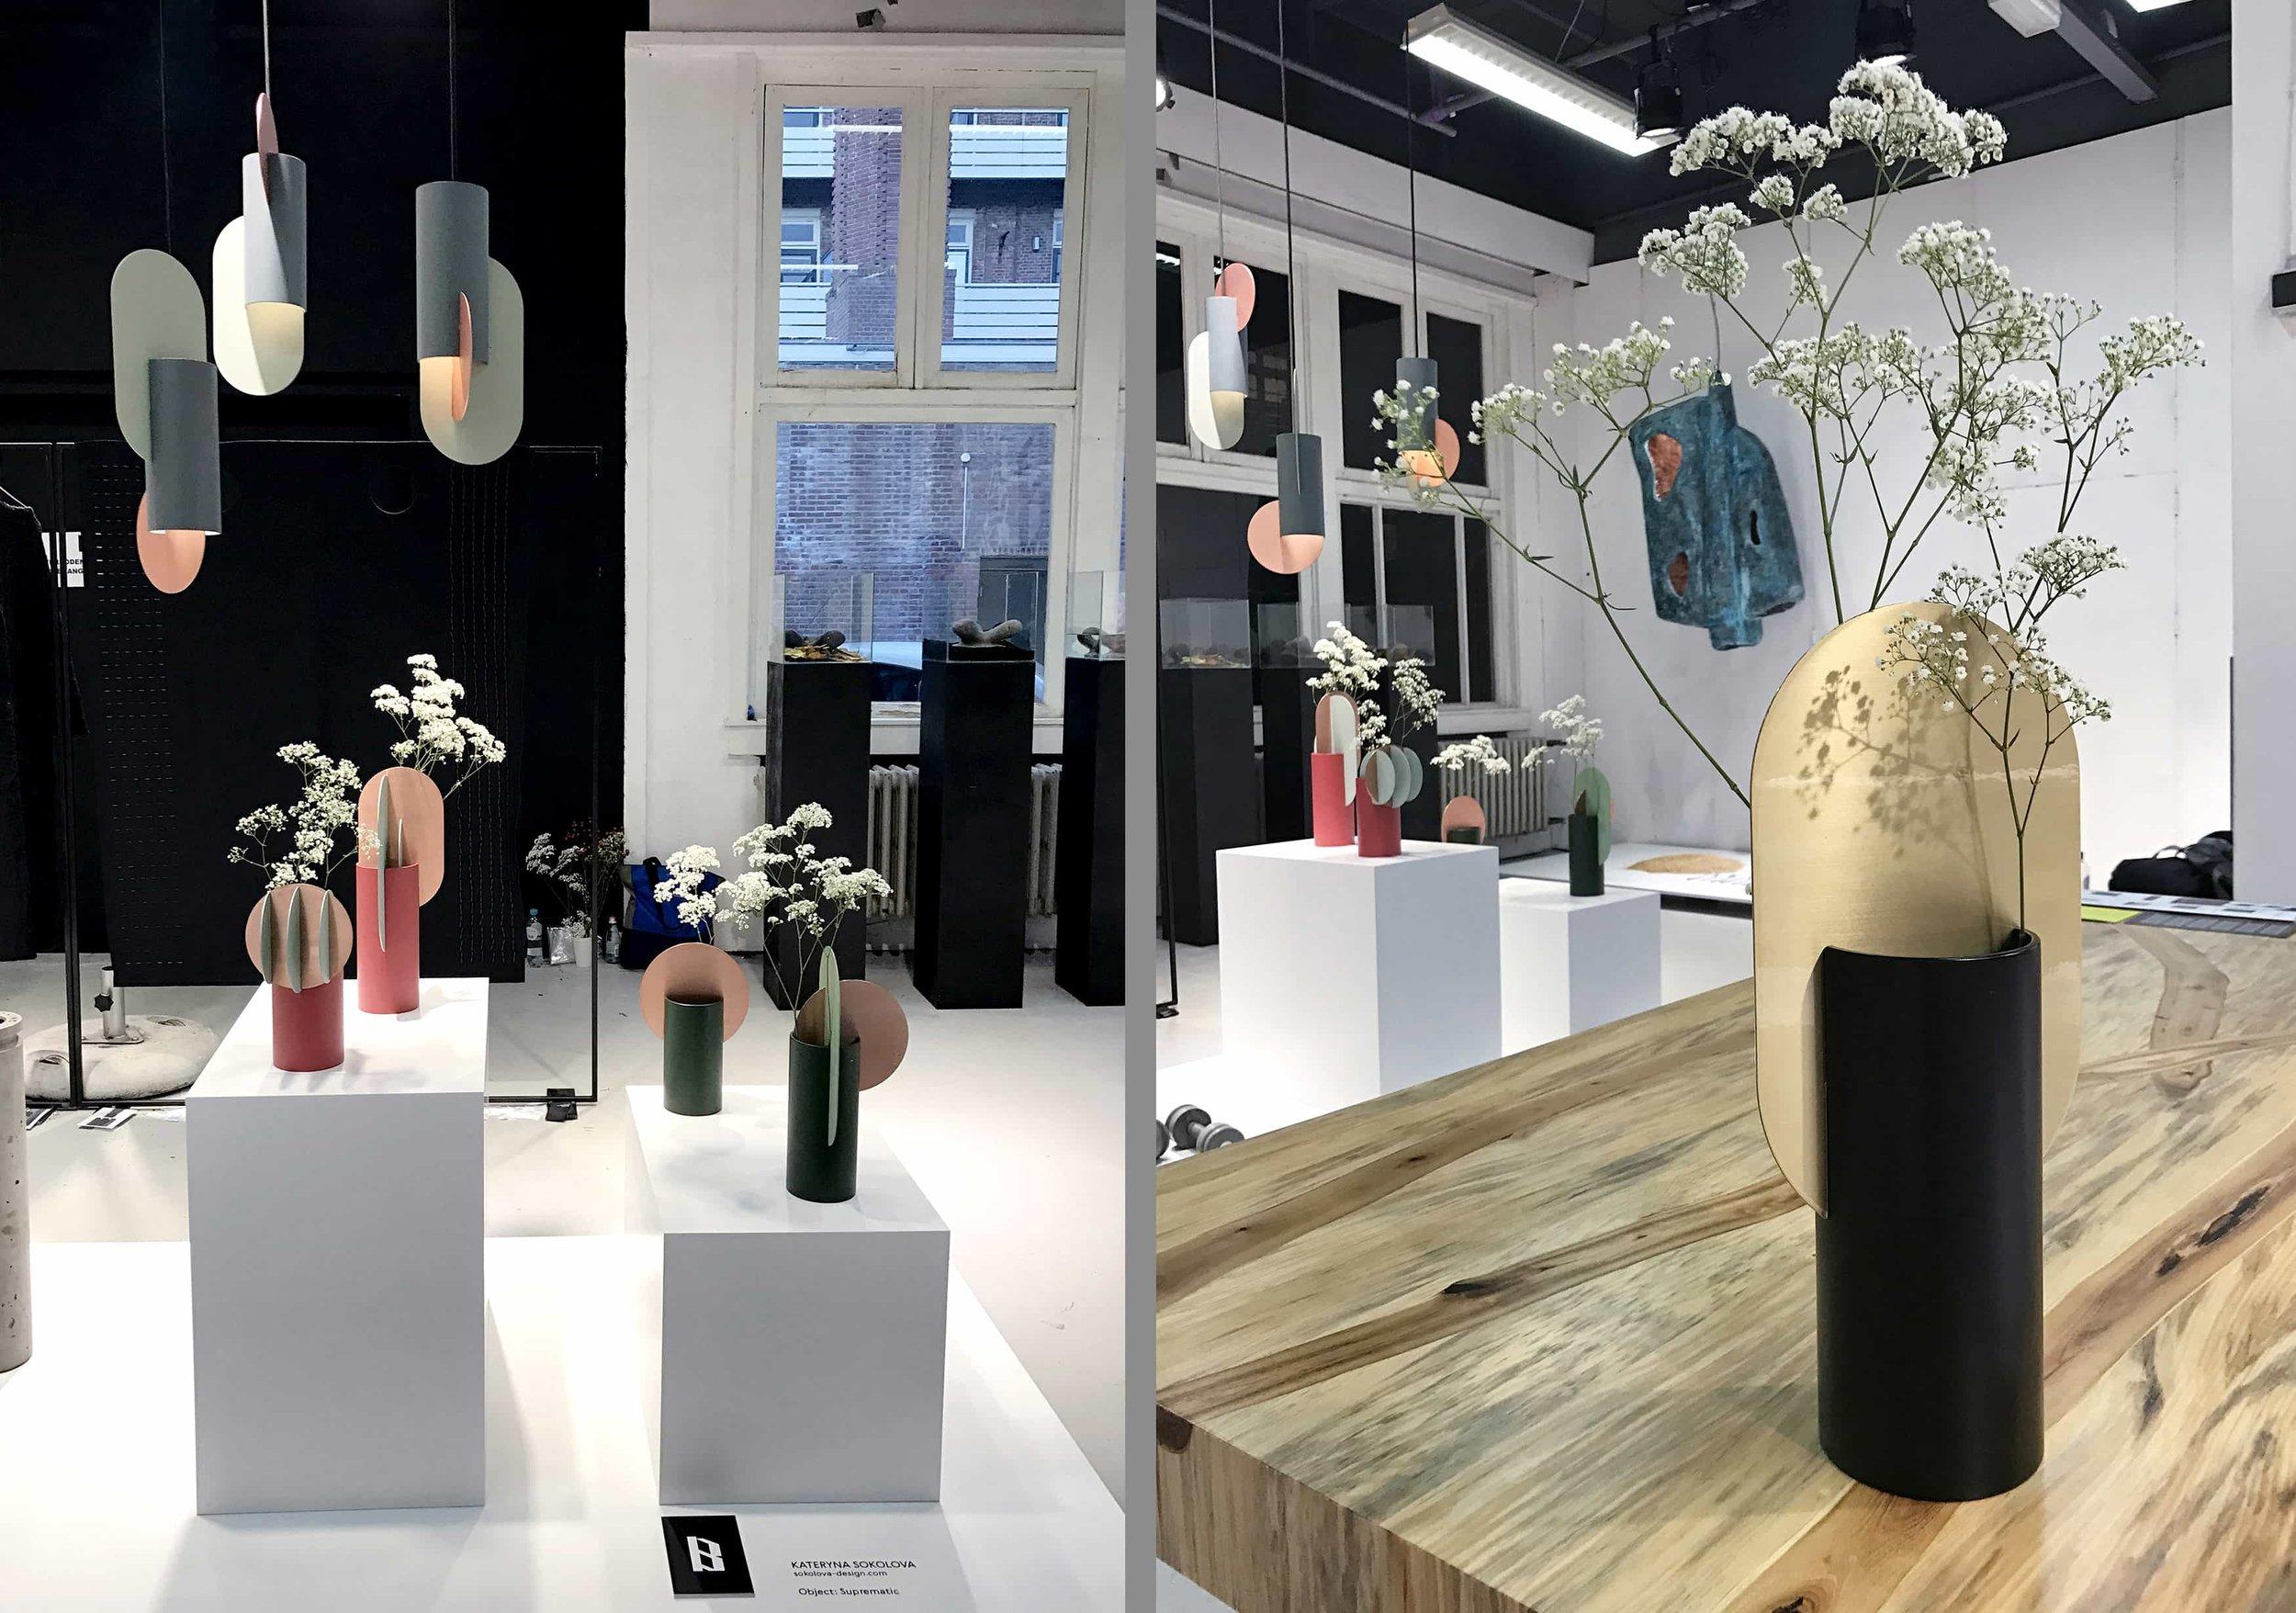 Dutch Design Week 2017 - Our debut at Dutch Design Week 2017.Eindhoven, October 21-29, 2017Location: Temporary Art Centrum (TAC), big hall